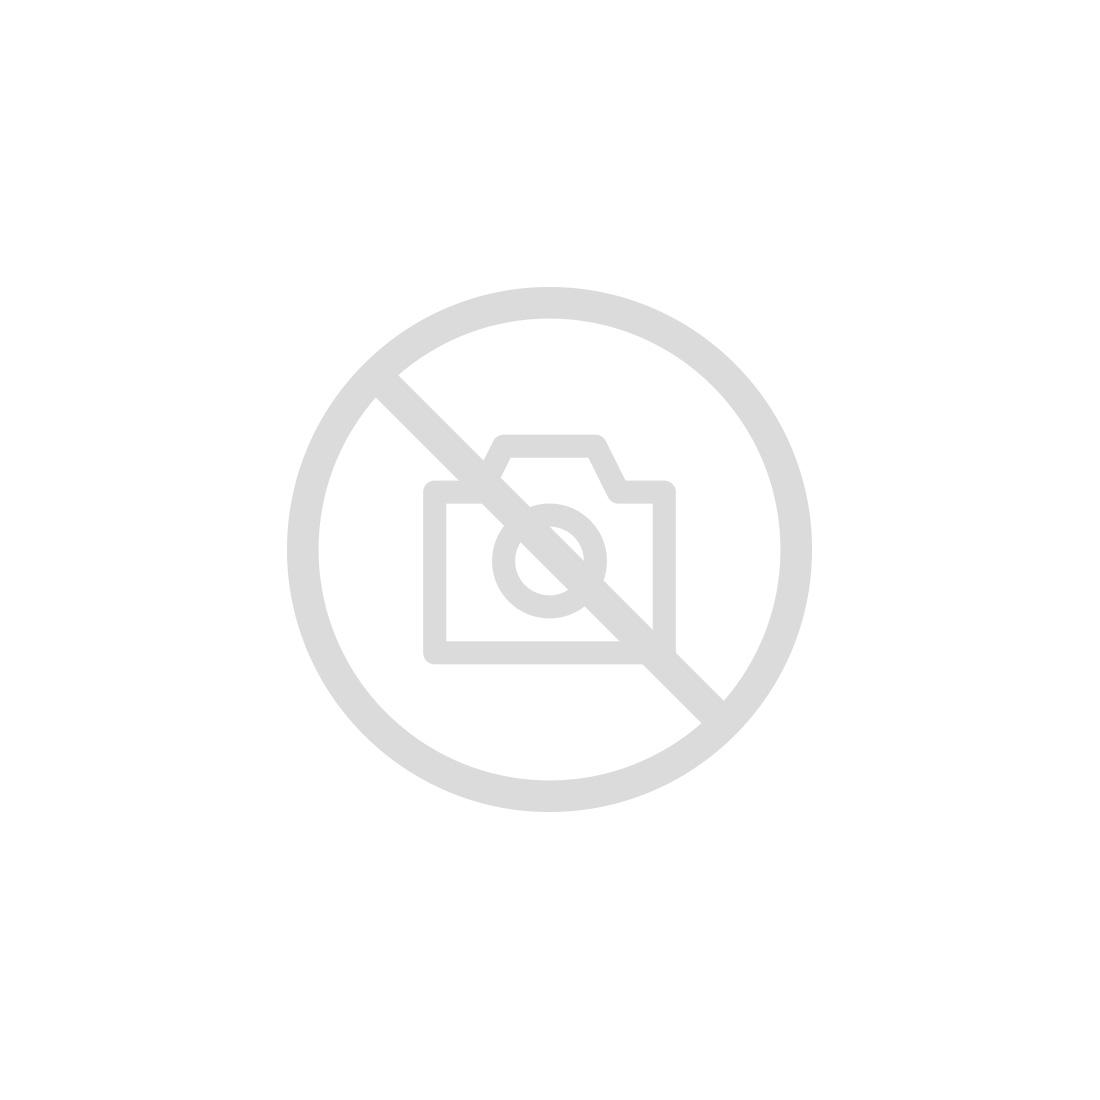 Kanex World Plug Adapter with 2-Port USB - Black